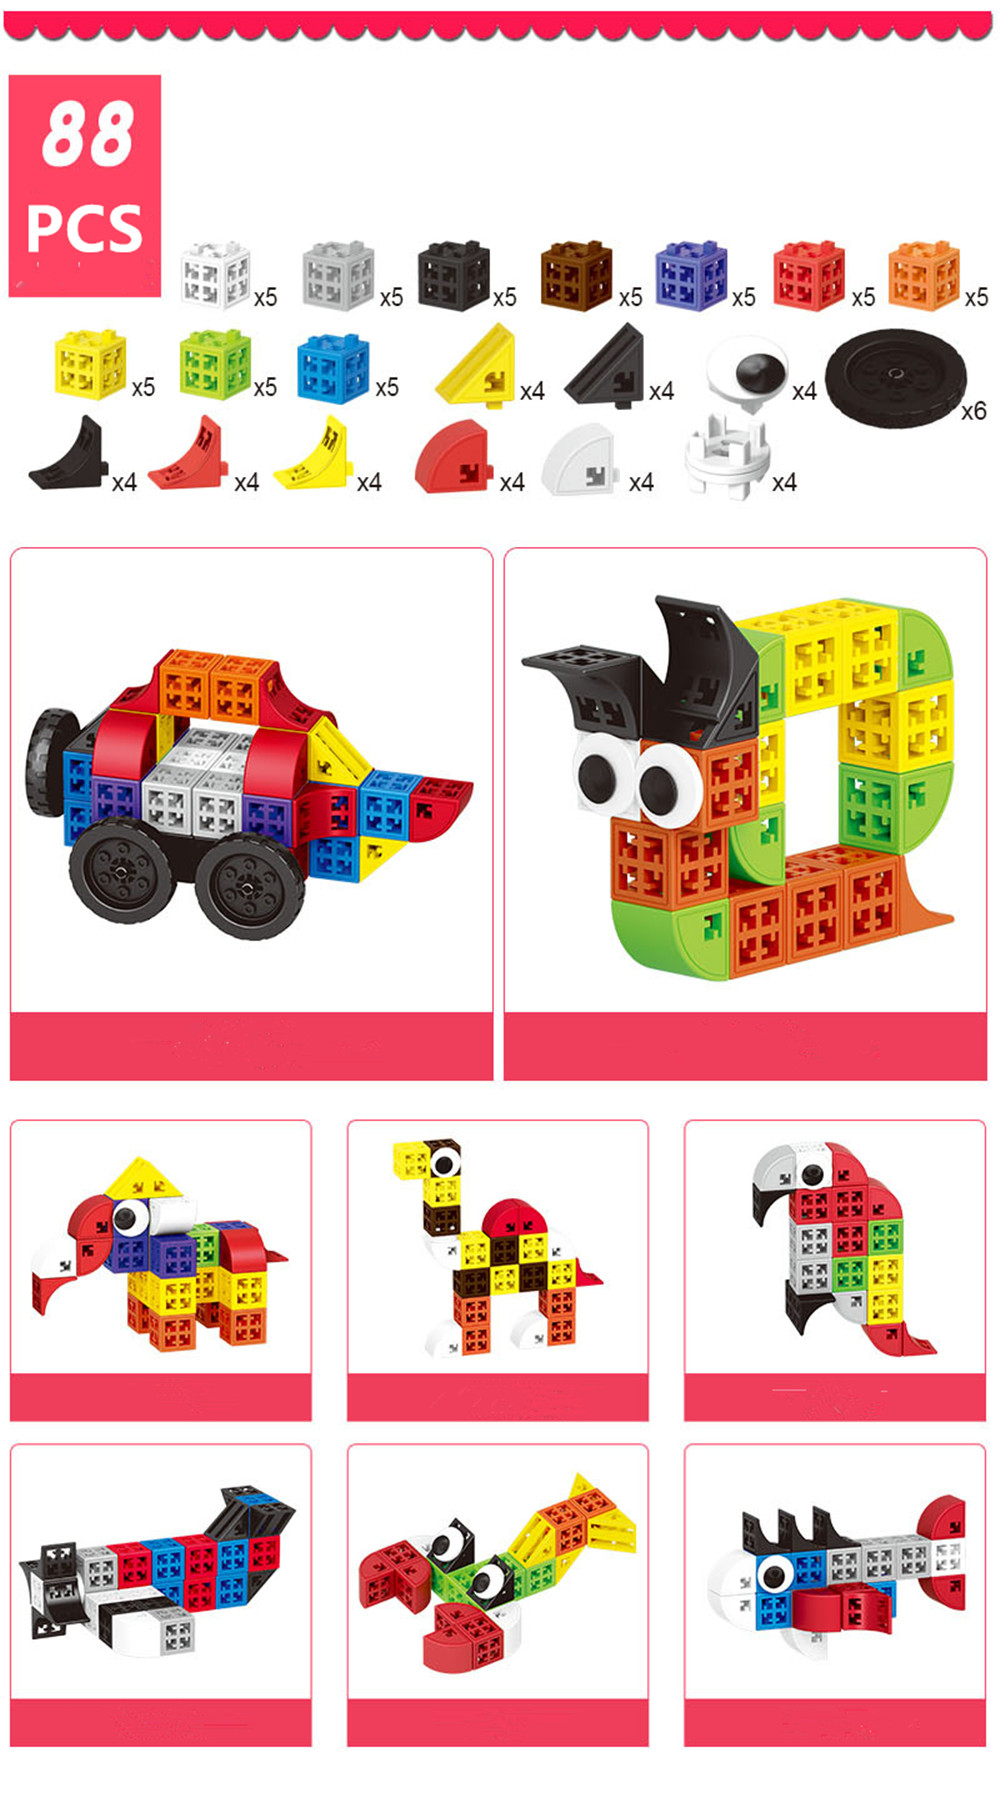 34/48/88/138/188pcs Blocks Cubes Unit Plastic Interlocking Construction Model Building Set of Early Educational Toys For Child 11